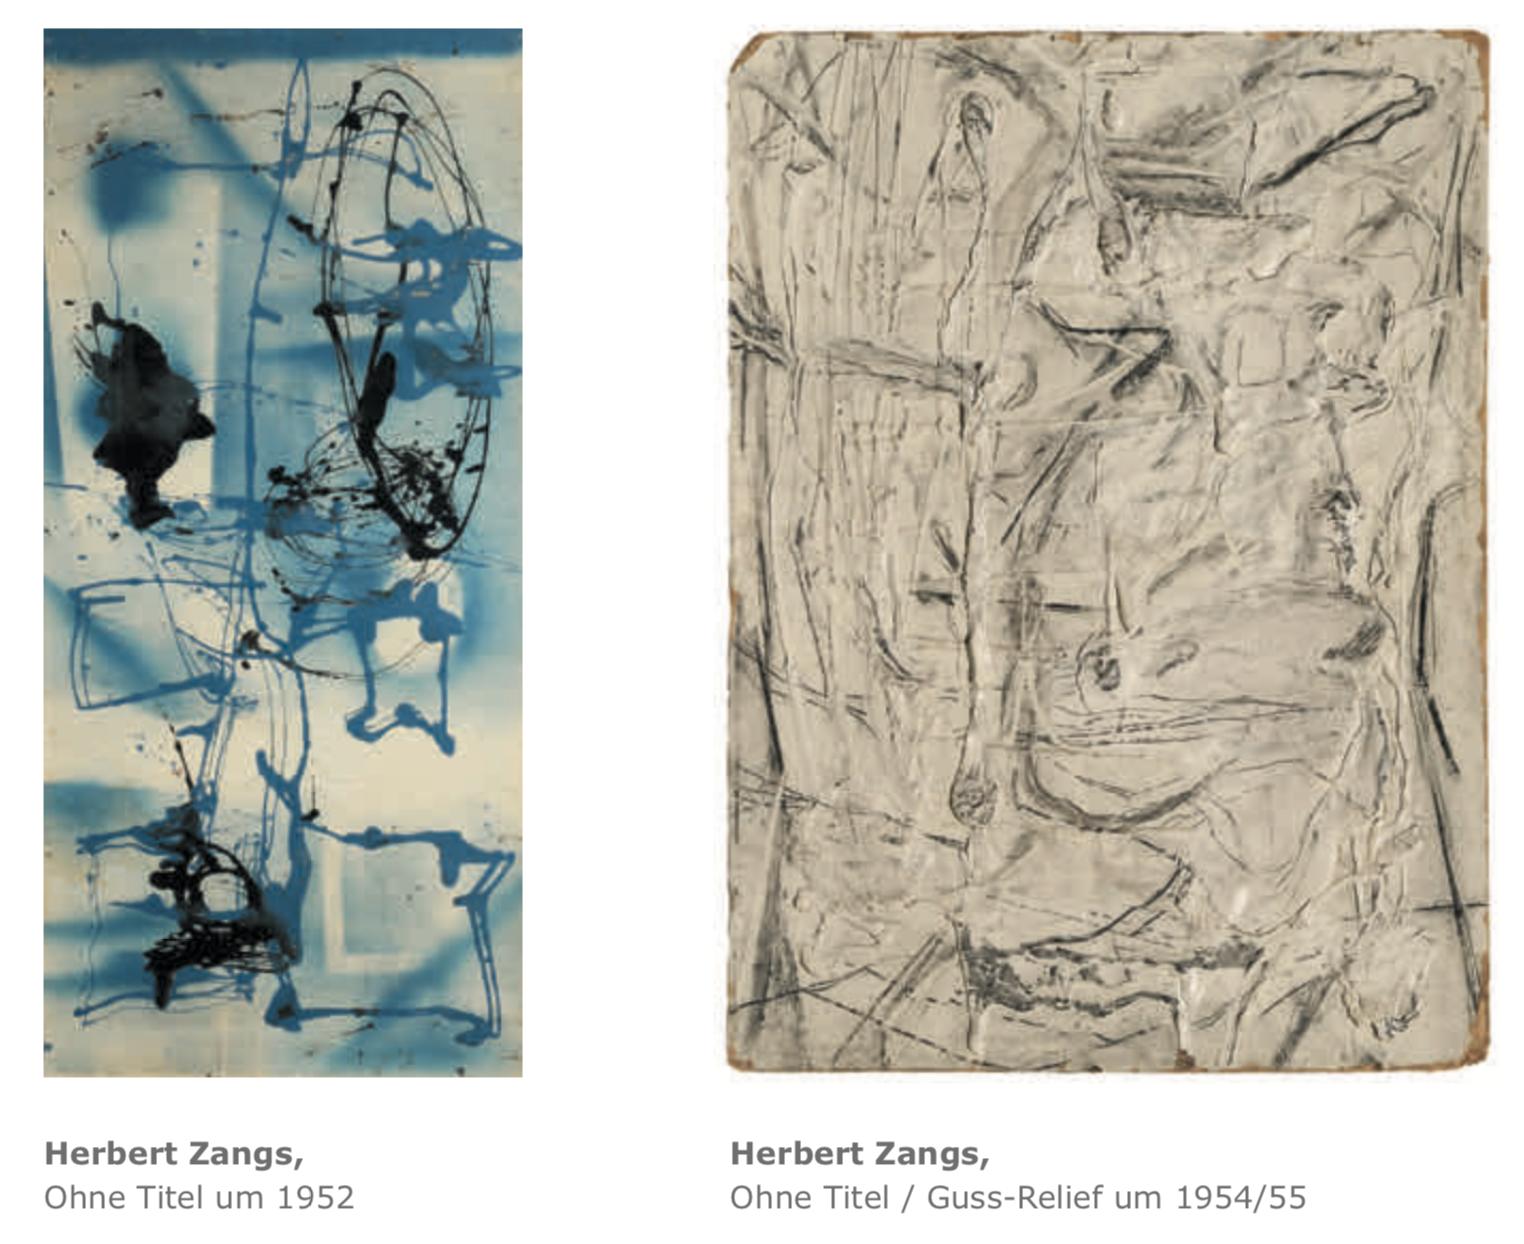 Galerie Maulberger Herbert Zangs Publikation Zeitzeugen Seite 119